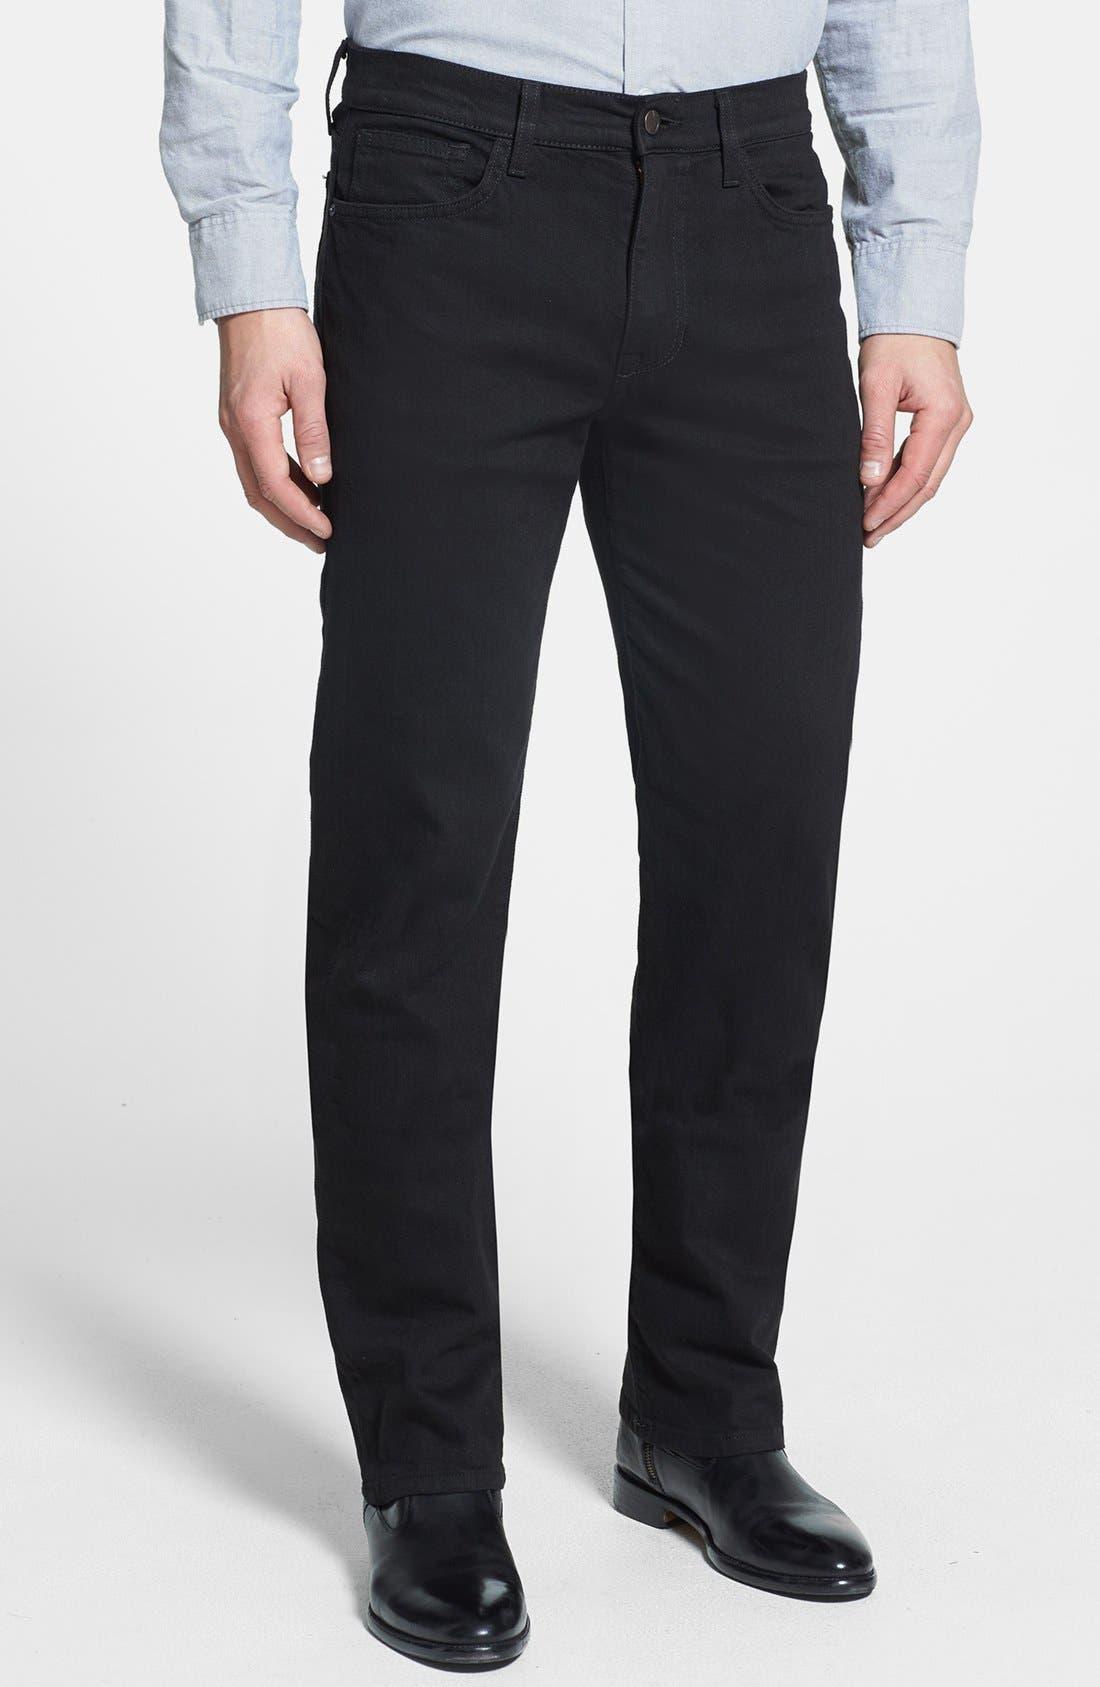 Alternate Image 1 Selected - Joe's 'Classic' Straight Leg Jeans (Jet Black)